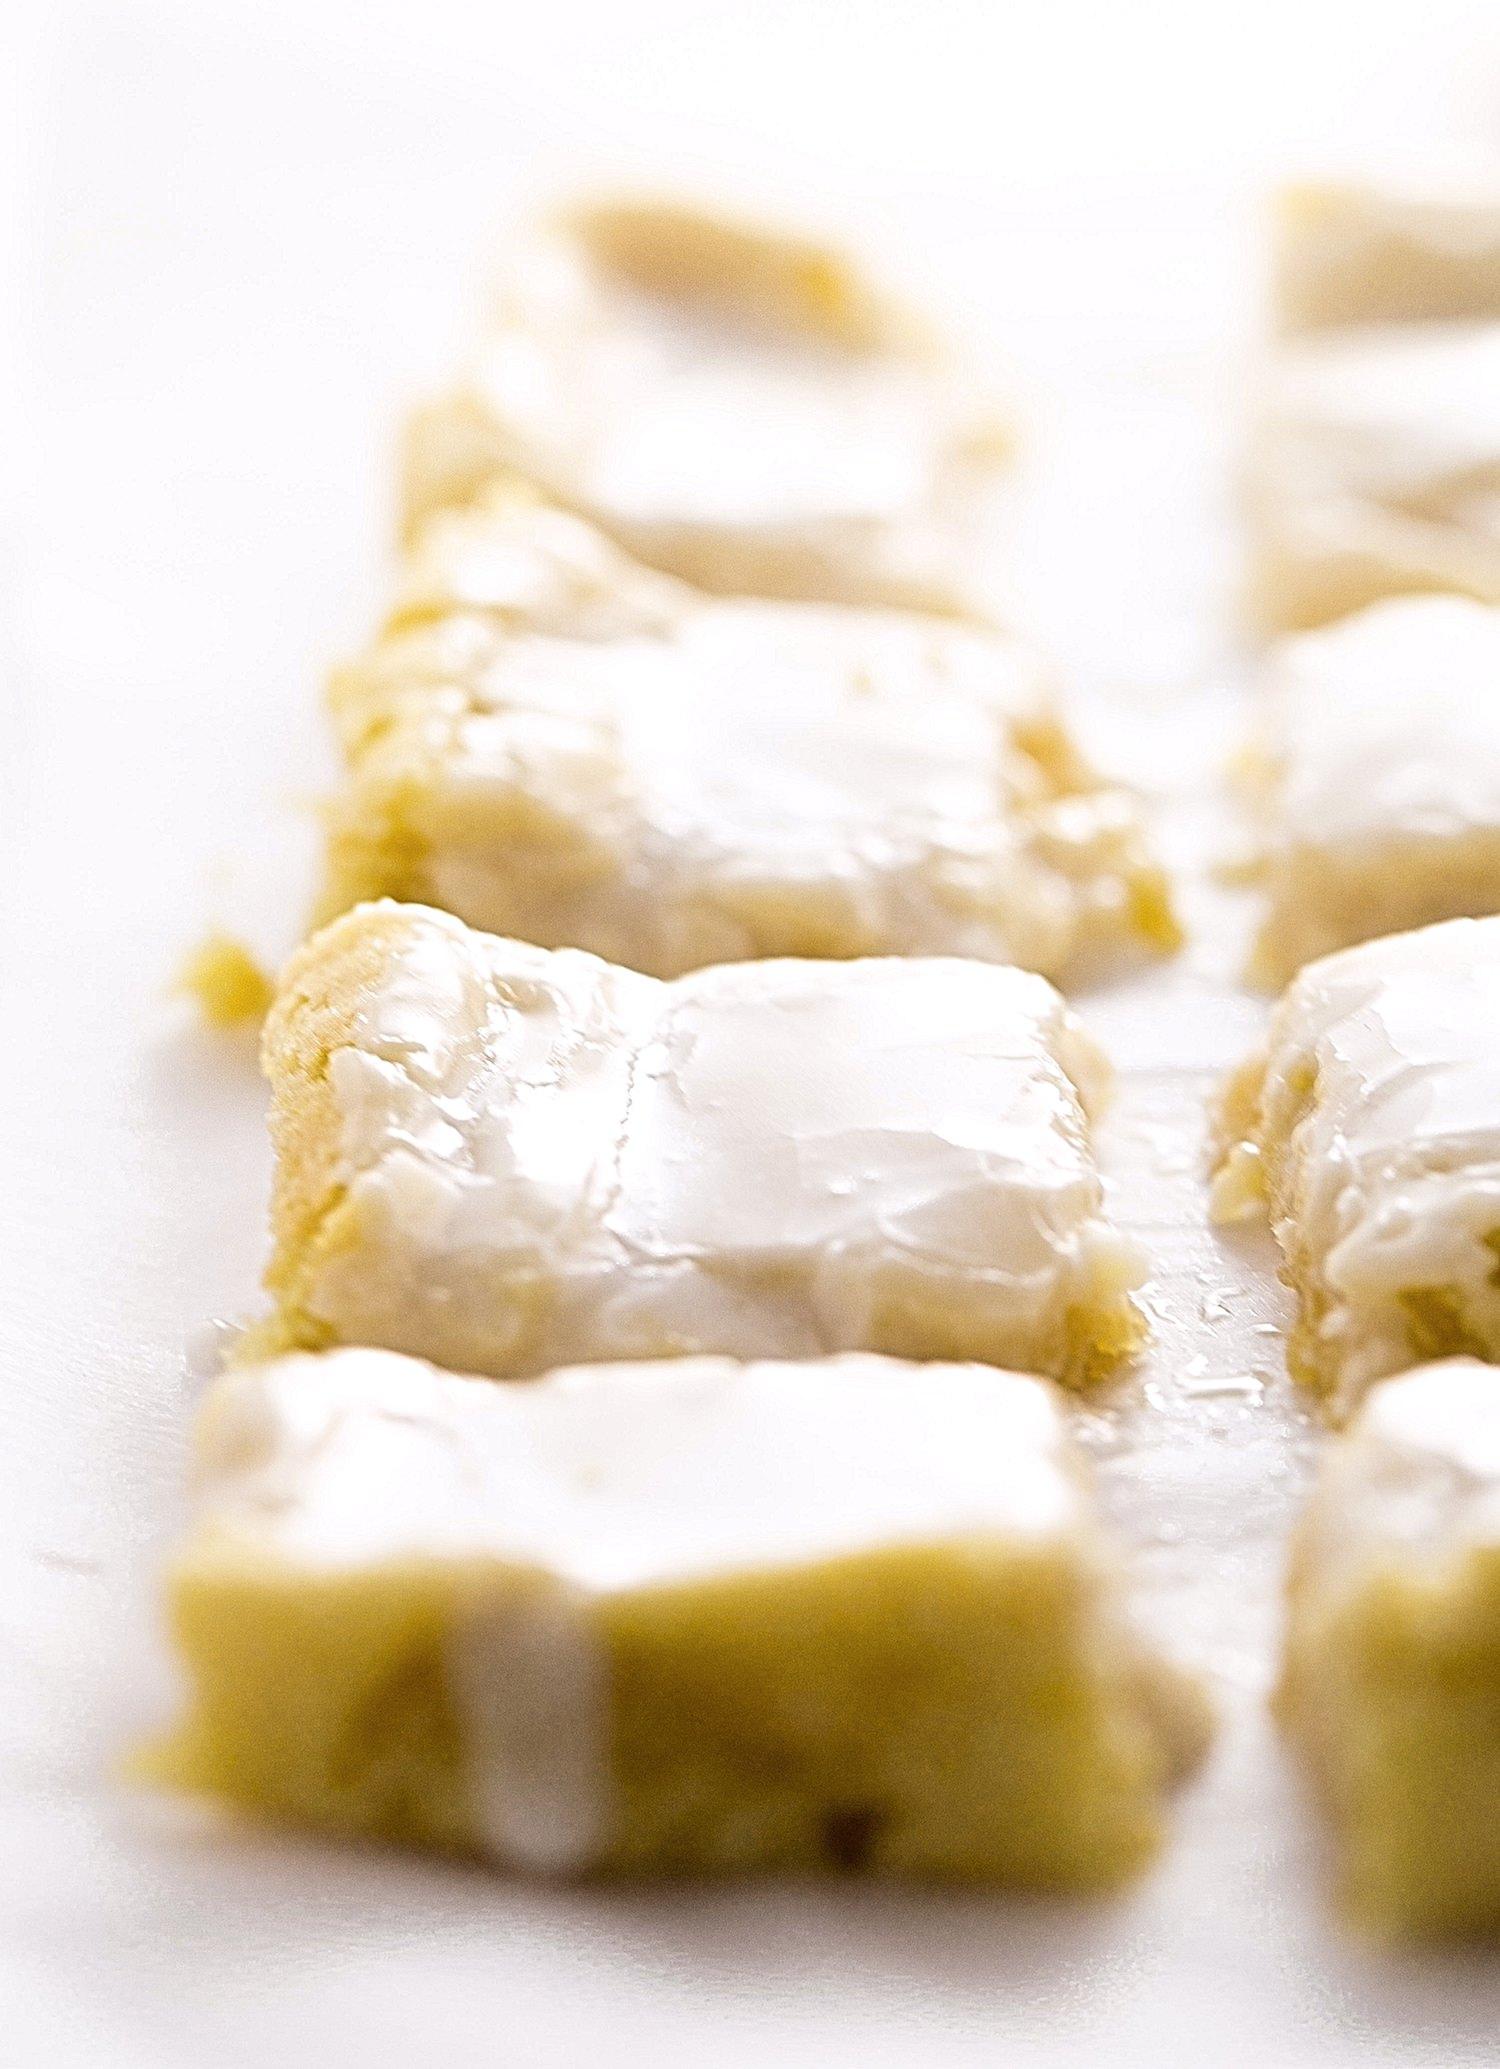 No-Butter Glazed Lemon Blondies: soft, gooey, rich lemon blondies, or lemonies. Made with coconut oil and a tangy lemon glaze. So easy!